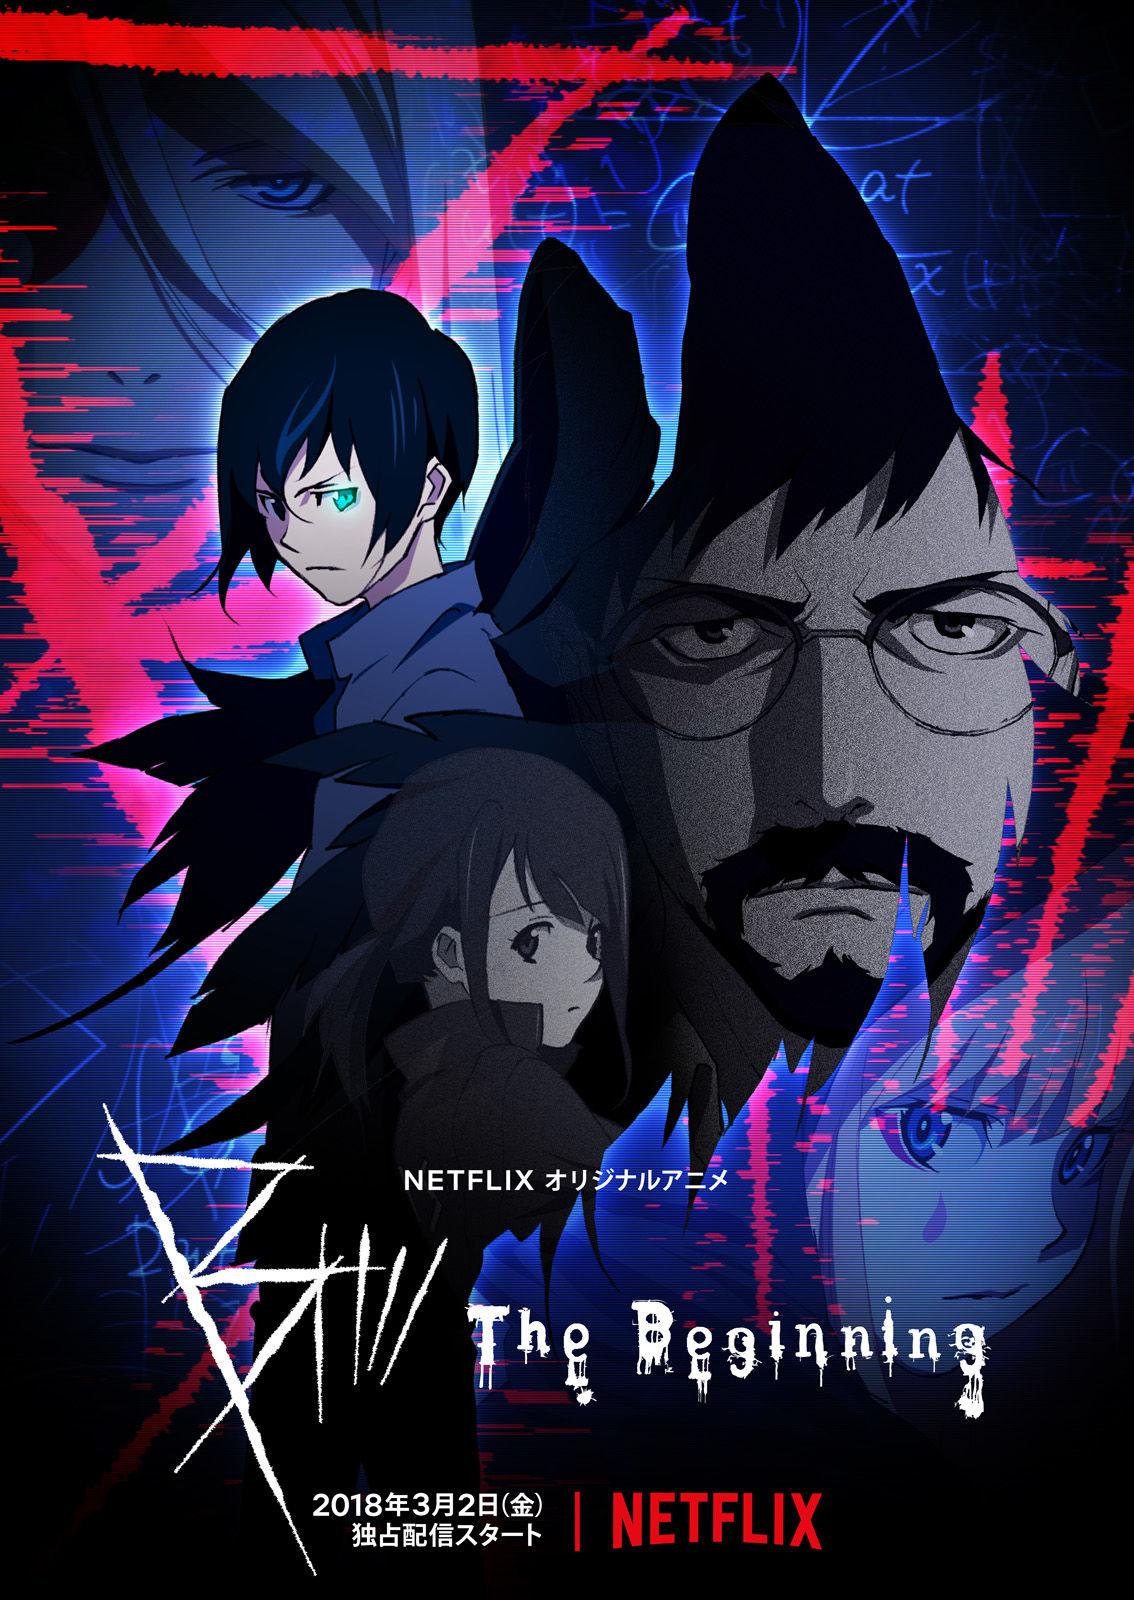 B: The Beginning ne zaman